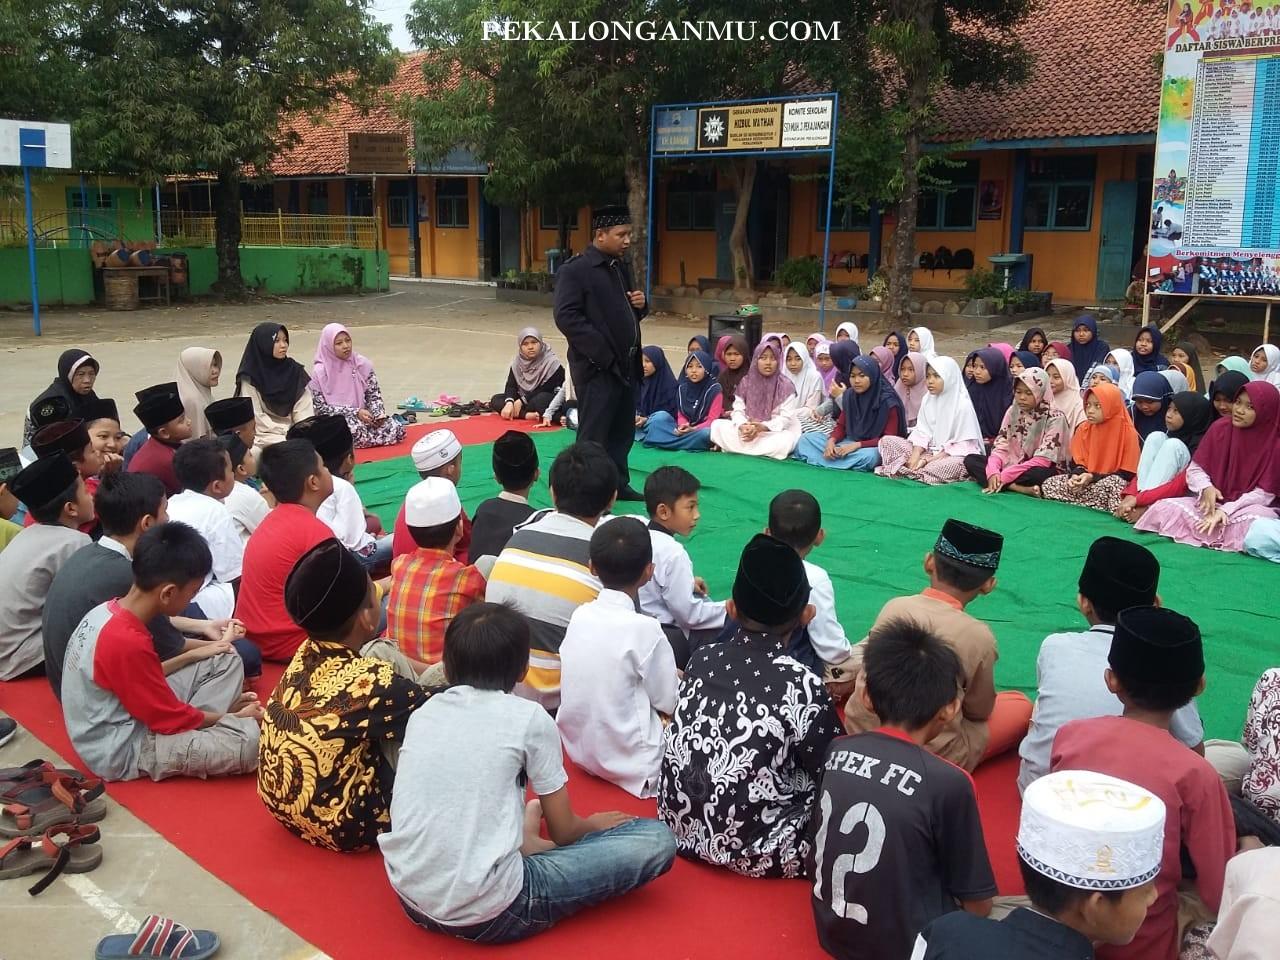 Tingkatkan Iman dan Taqwa, SDM 3 Pekajangan Gelar Pesantern Ramadhan